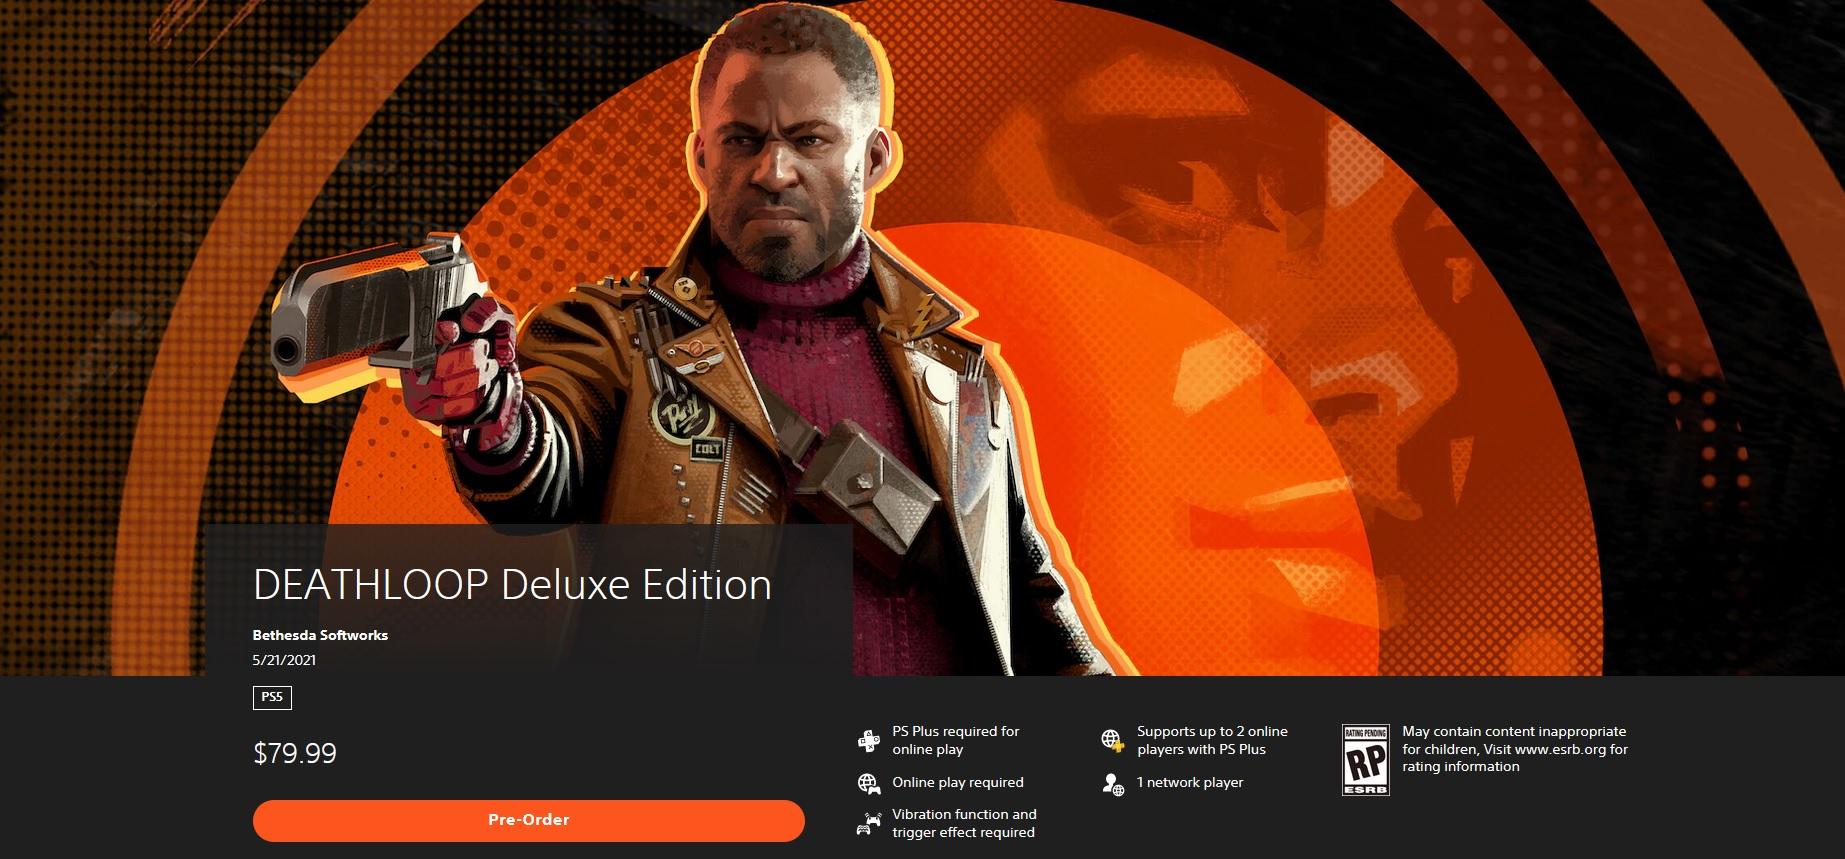 PlayStation Store odhalil datum vydání Deathloop